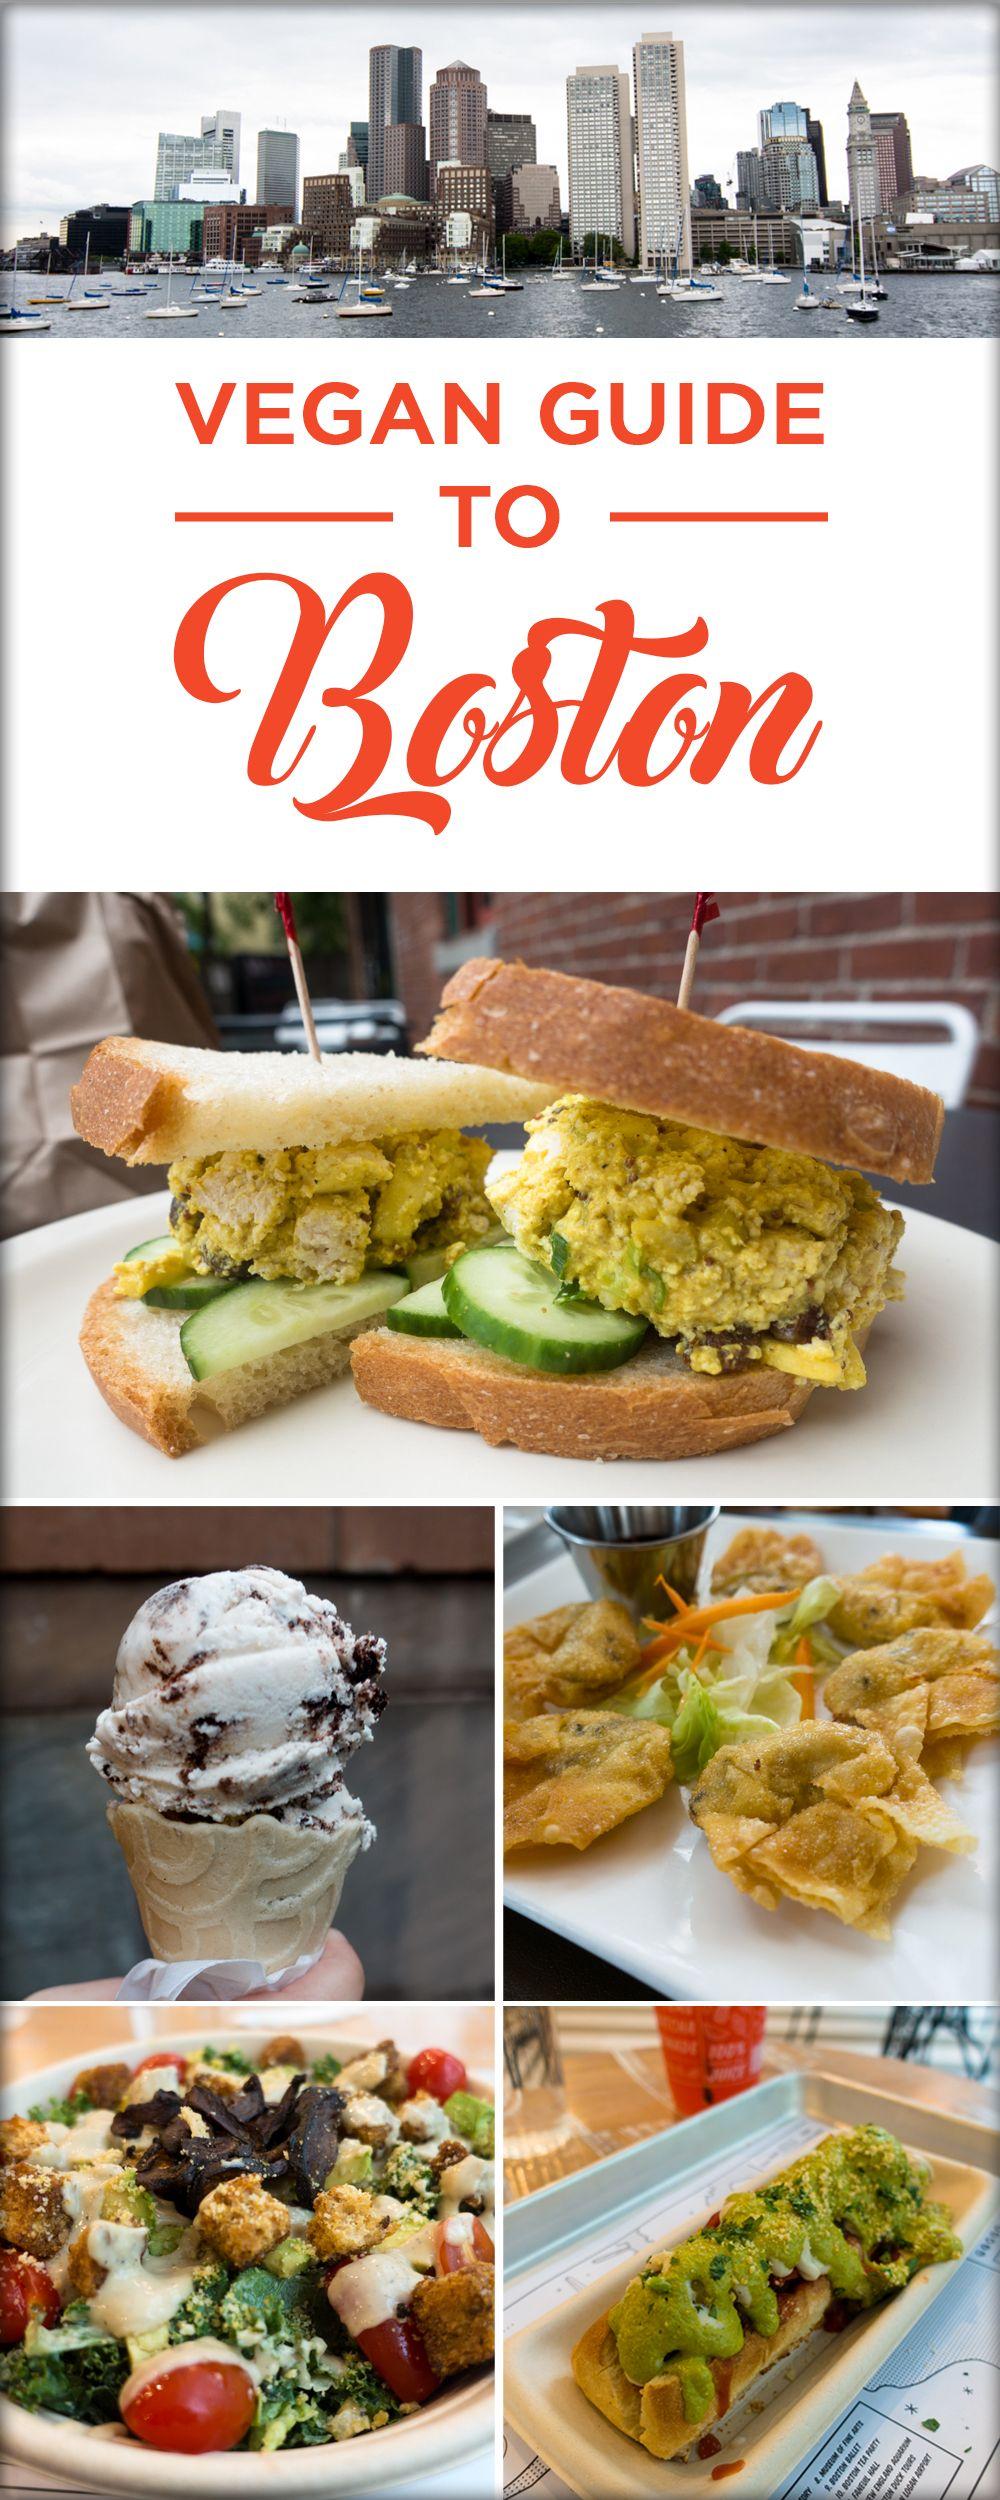 Vegan Guide To Boston Thyme Love Vegan Restaurants Vegan Friendly Restaurants Vegan Guide